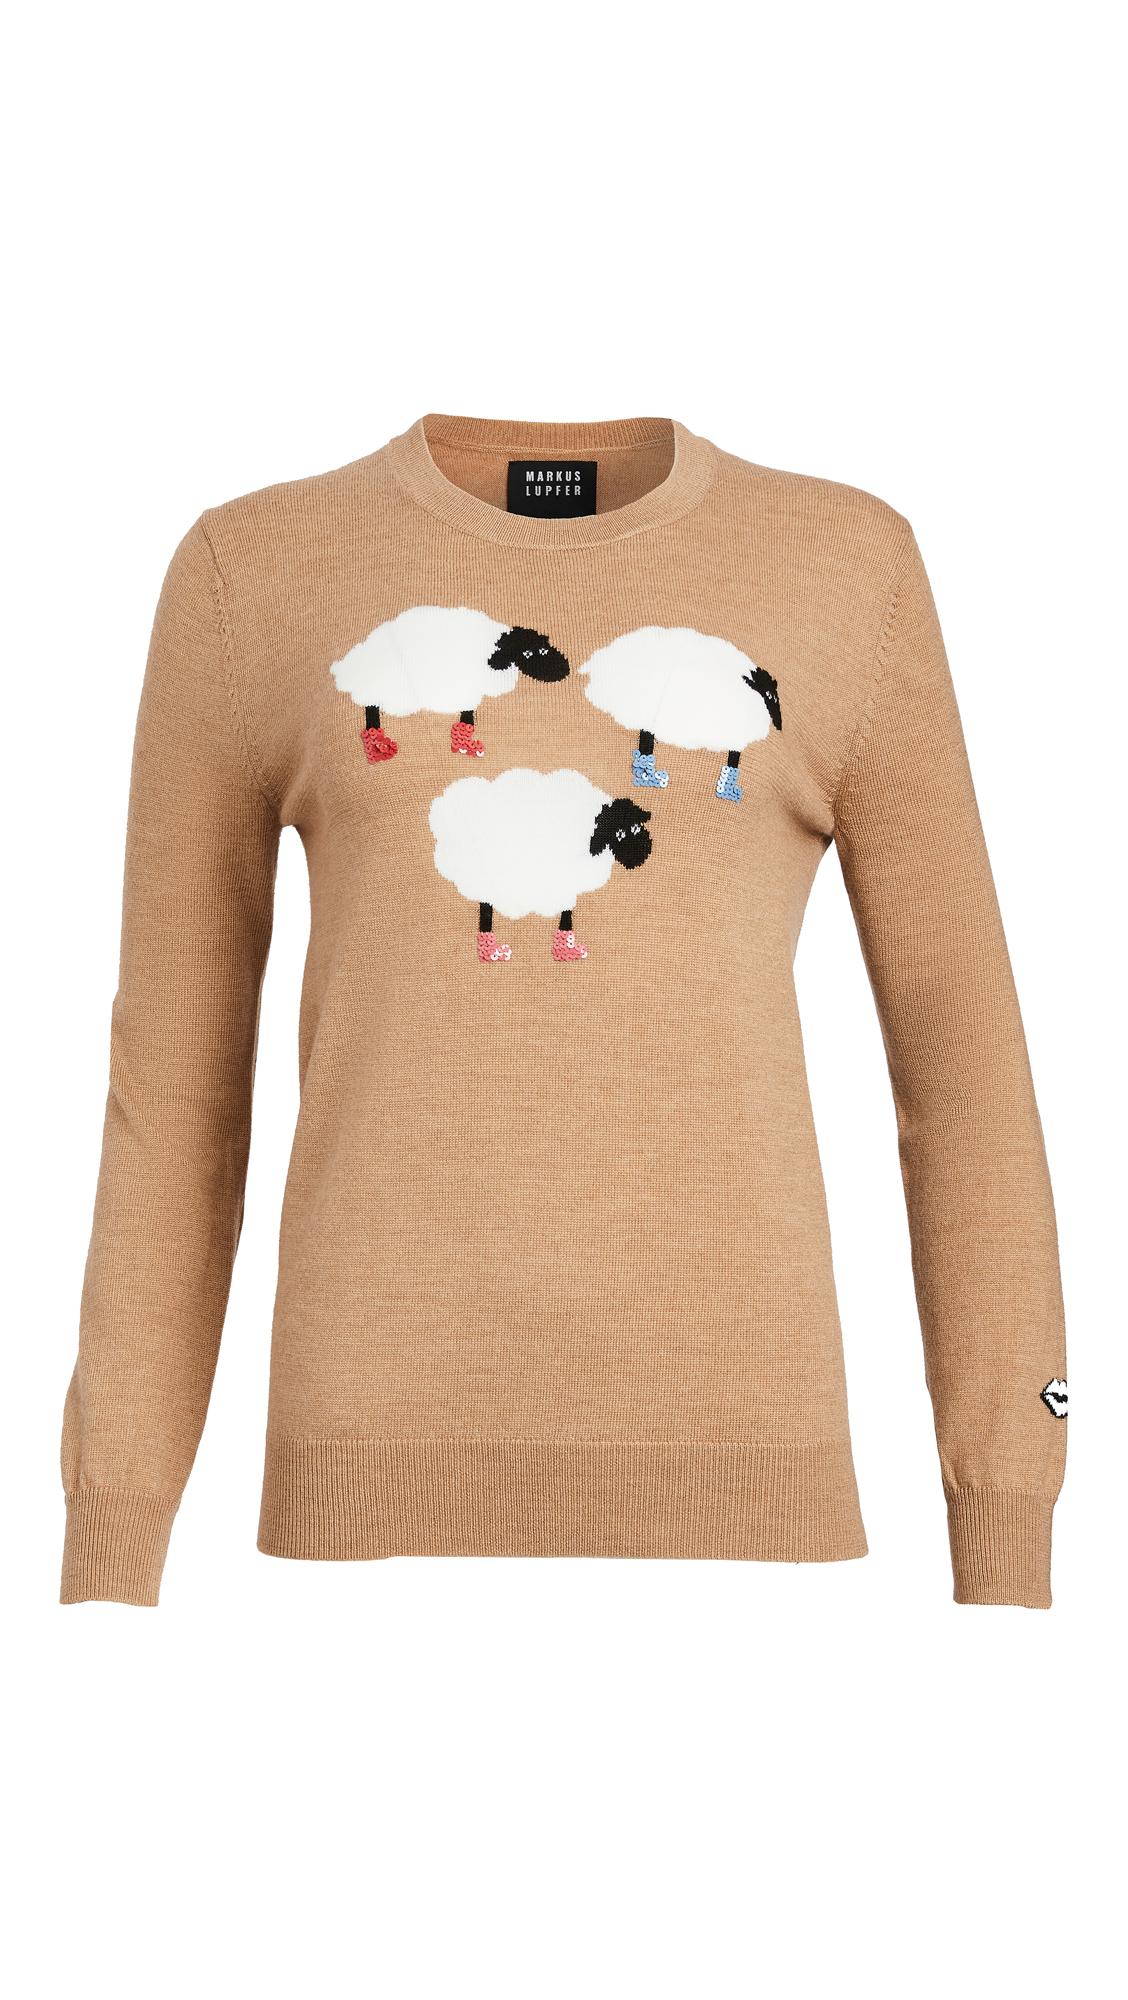 Markus Lupfer Natalie Sequin Sheep Sweater